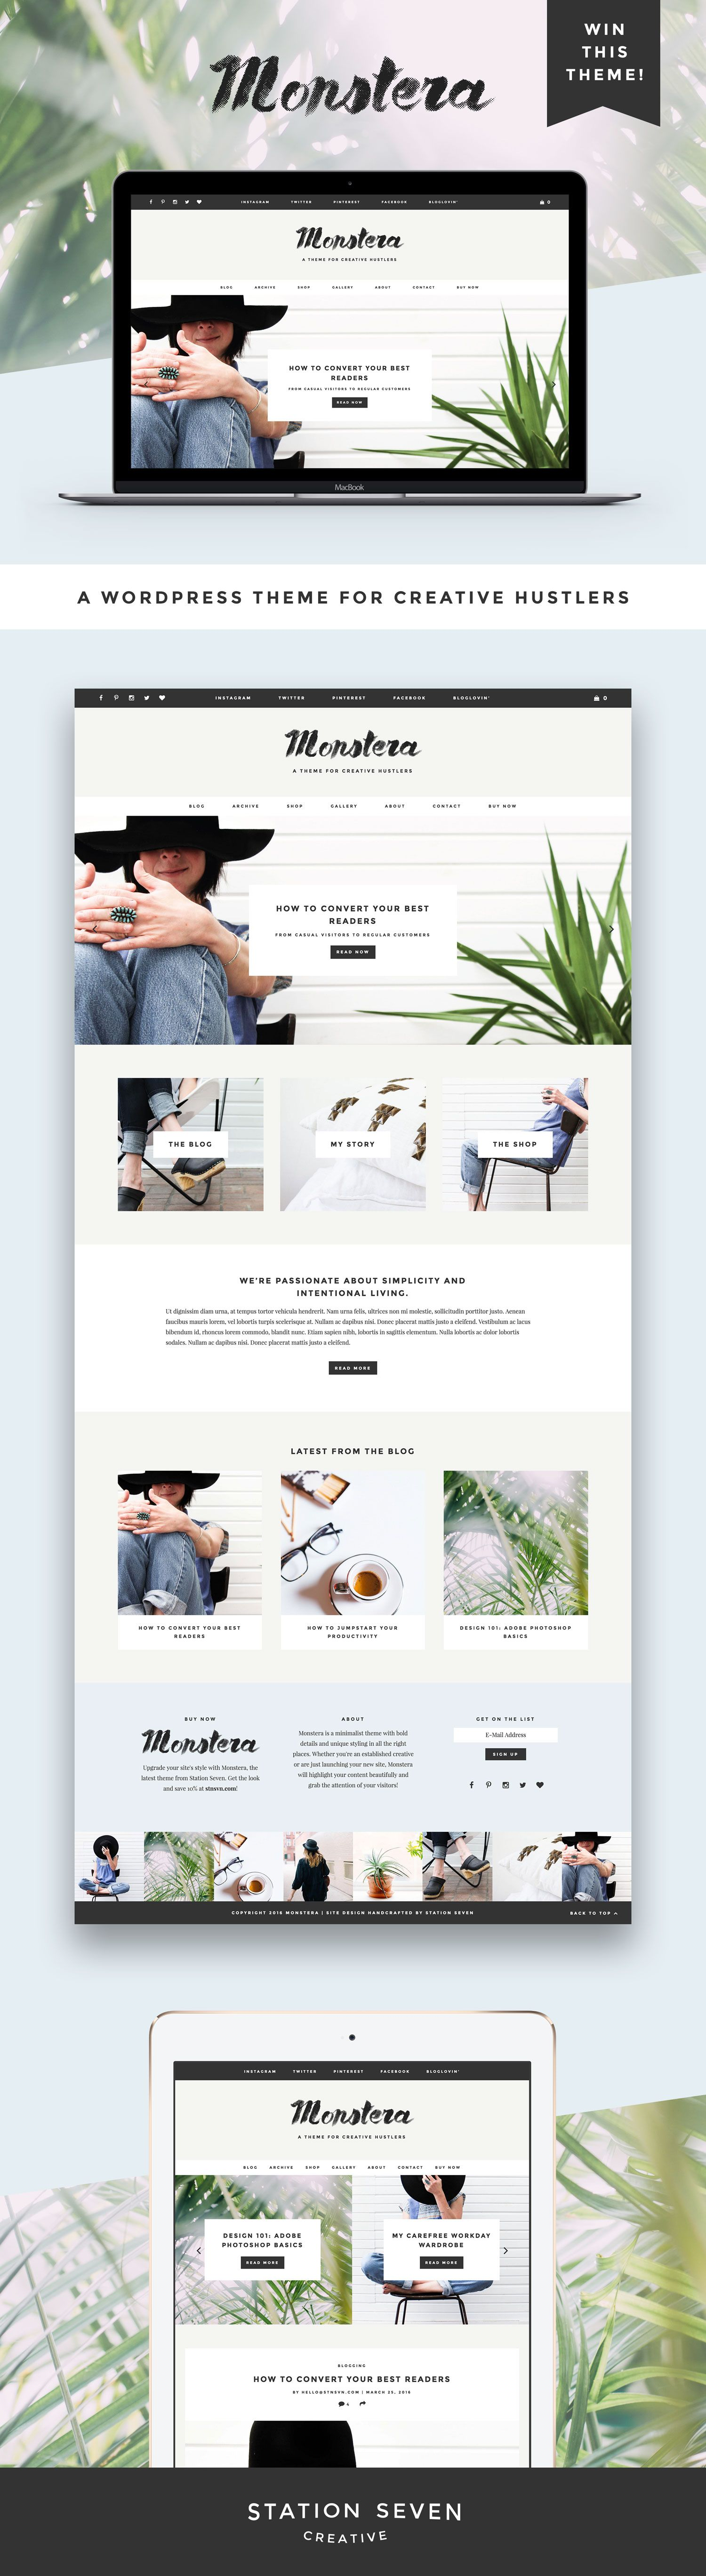 Monstera WordPress Theme | Minimalistas, Pagina web y Diseño paginas web